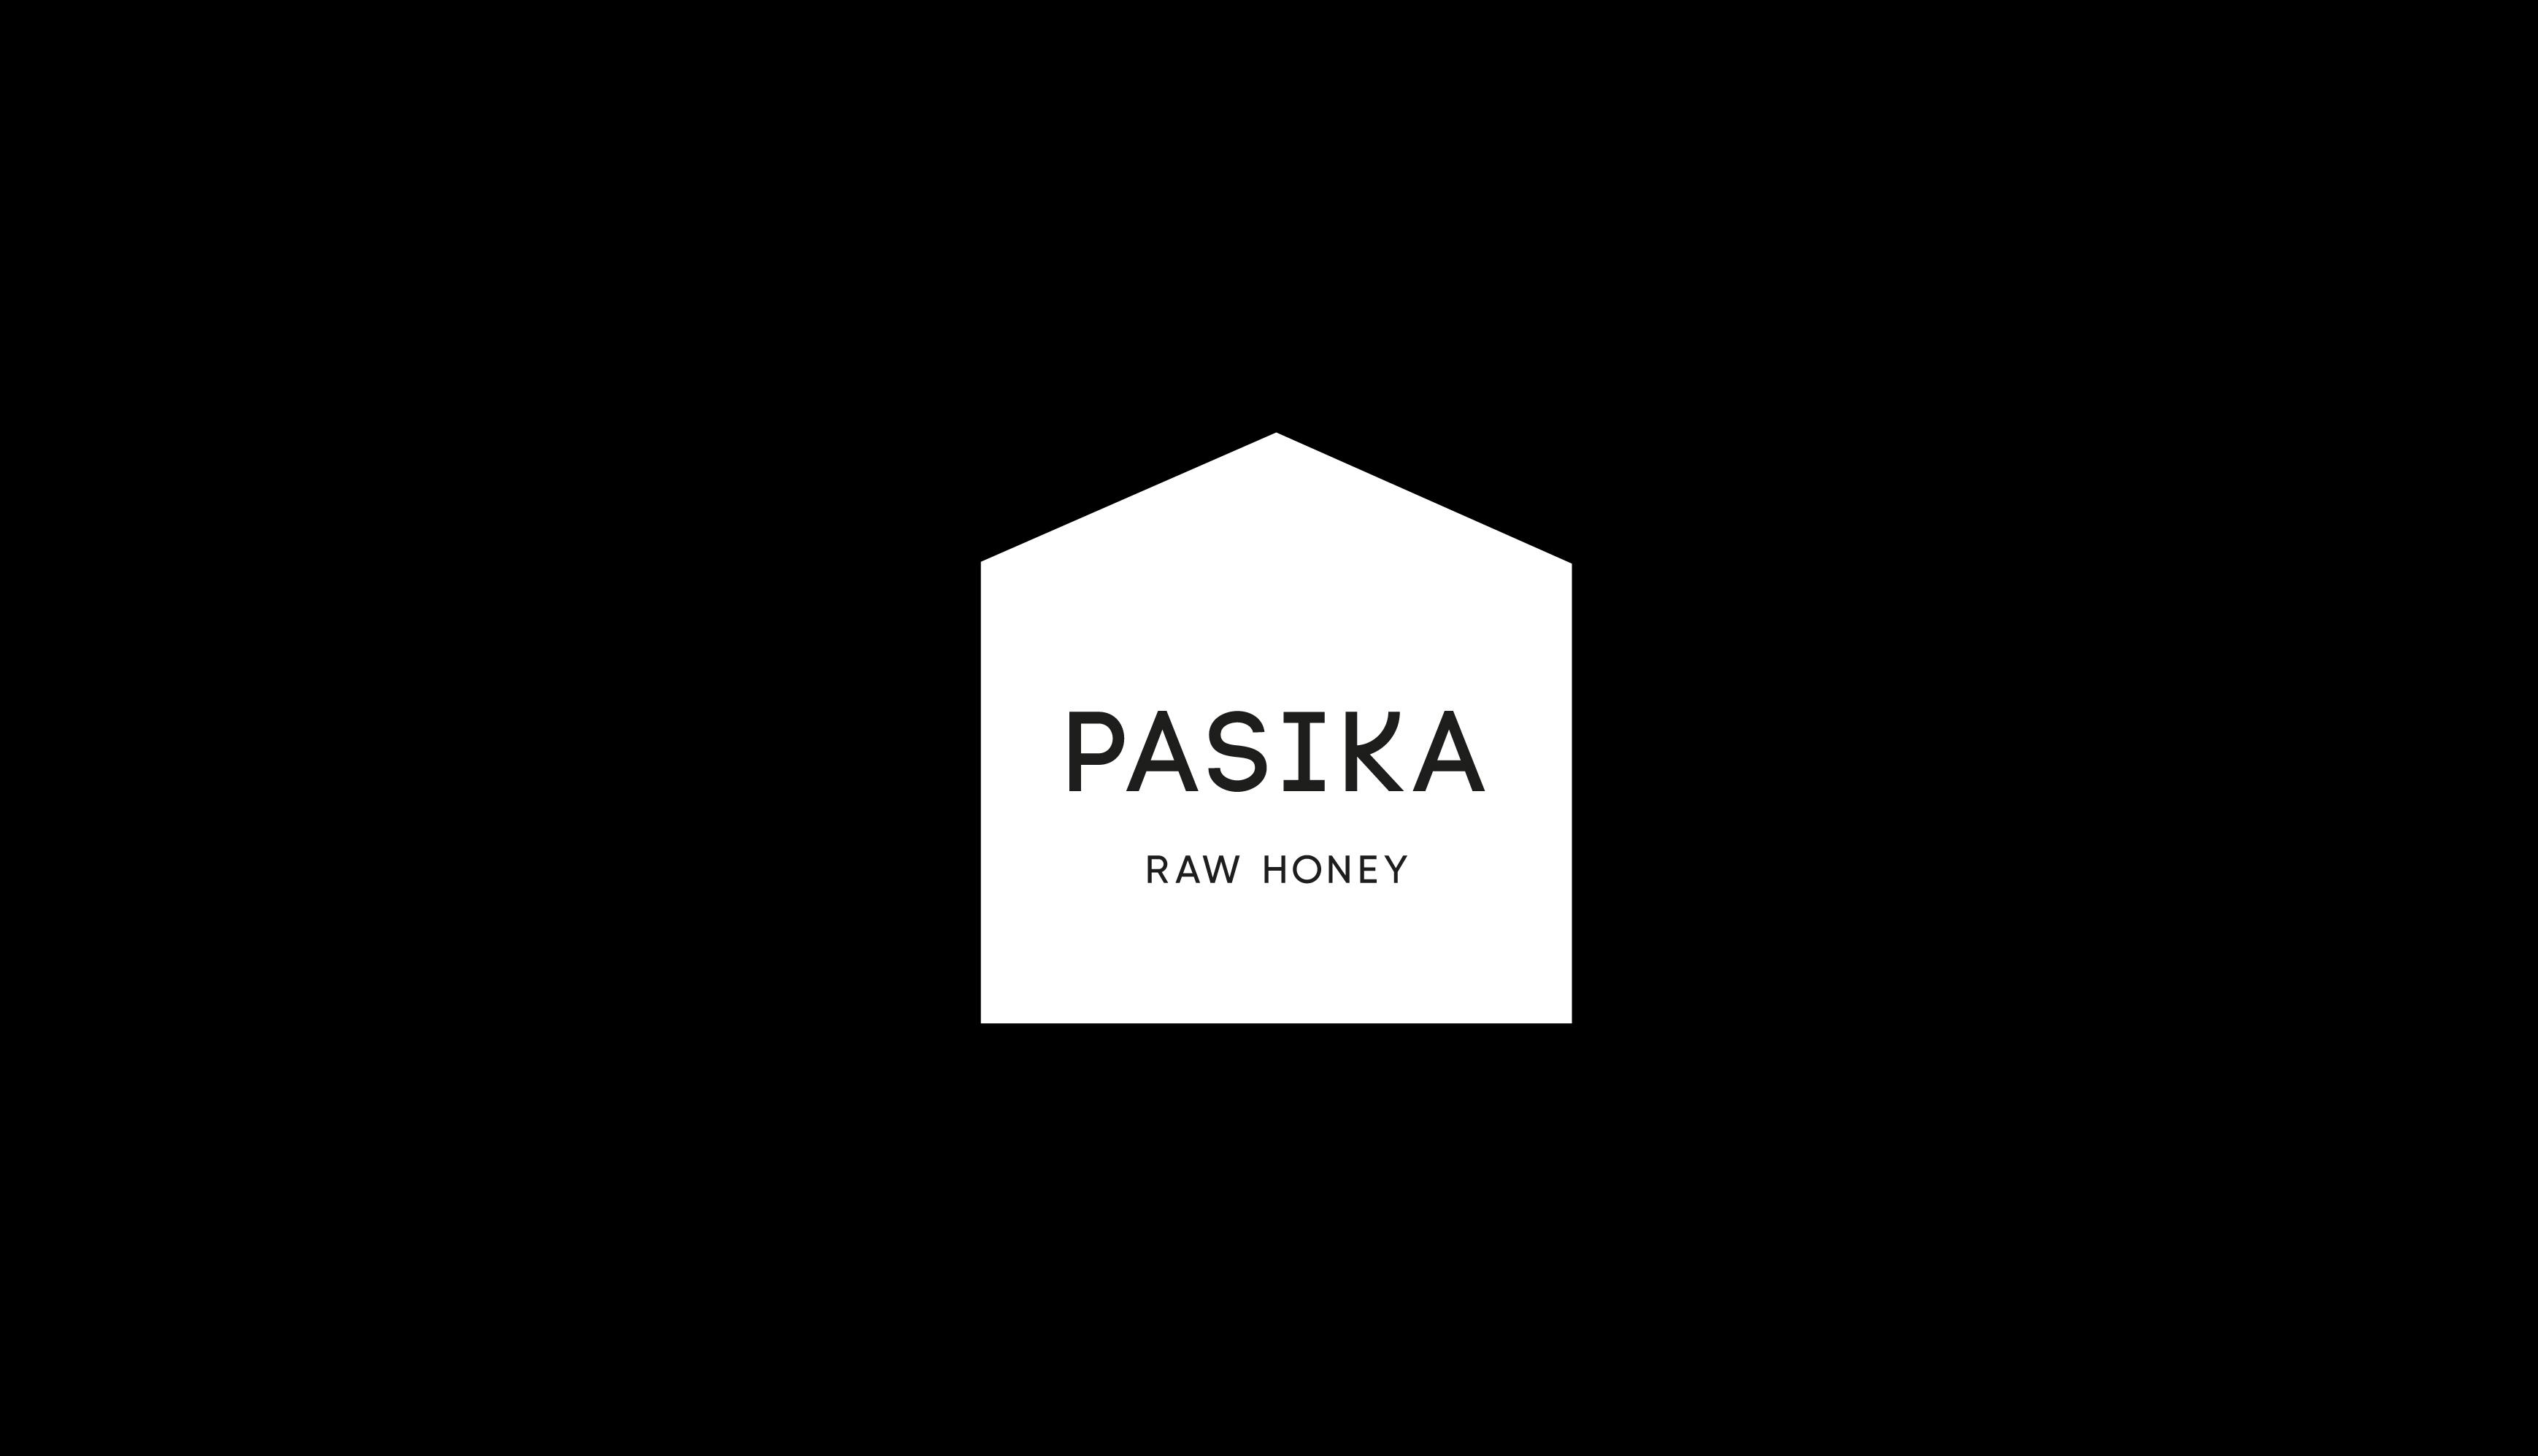 pasika honey label design